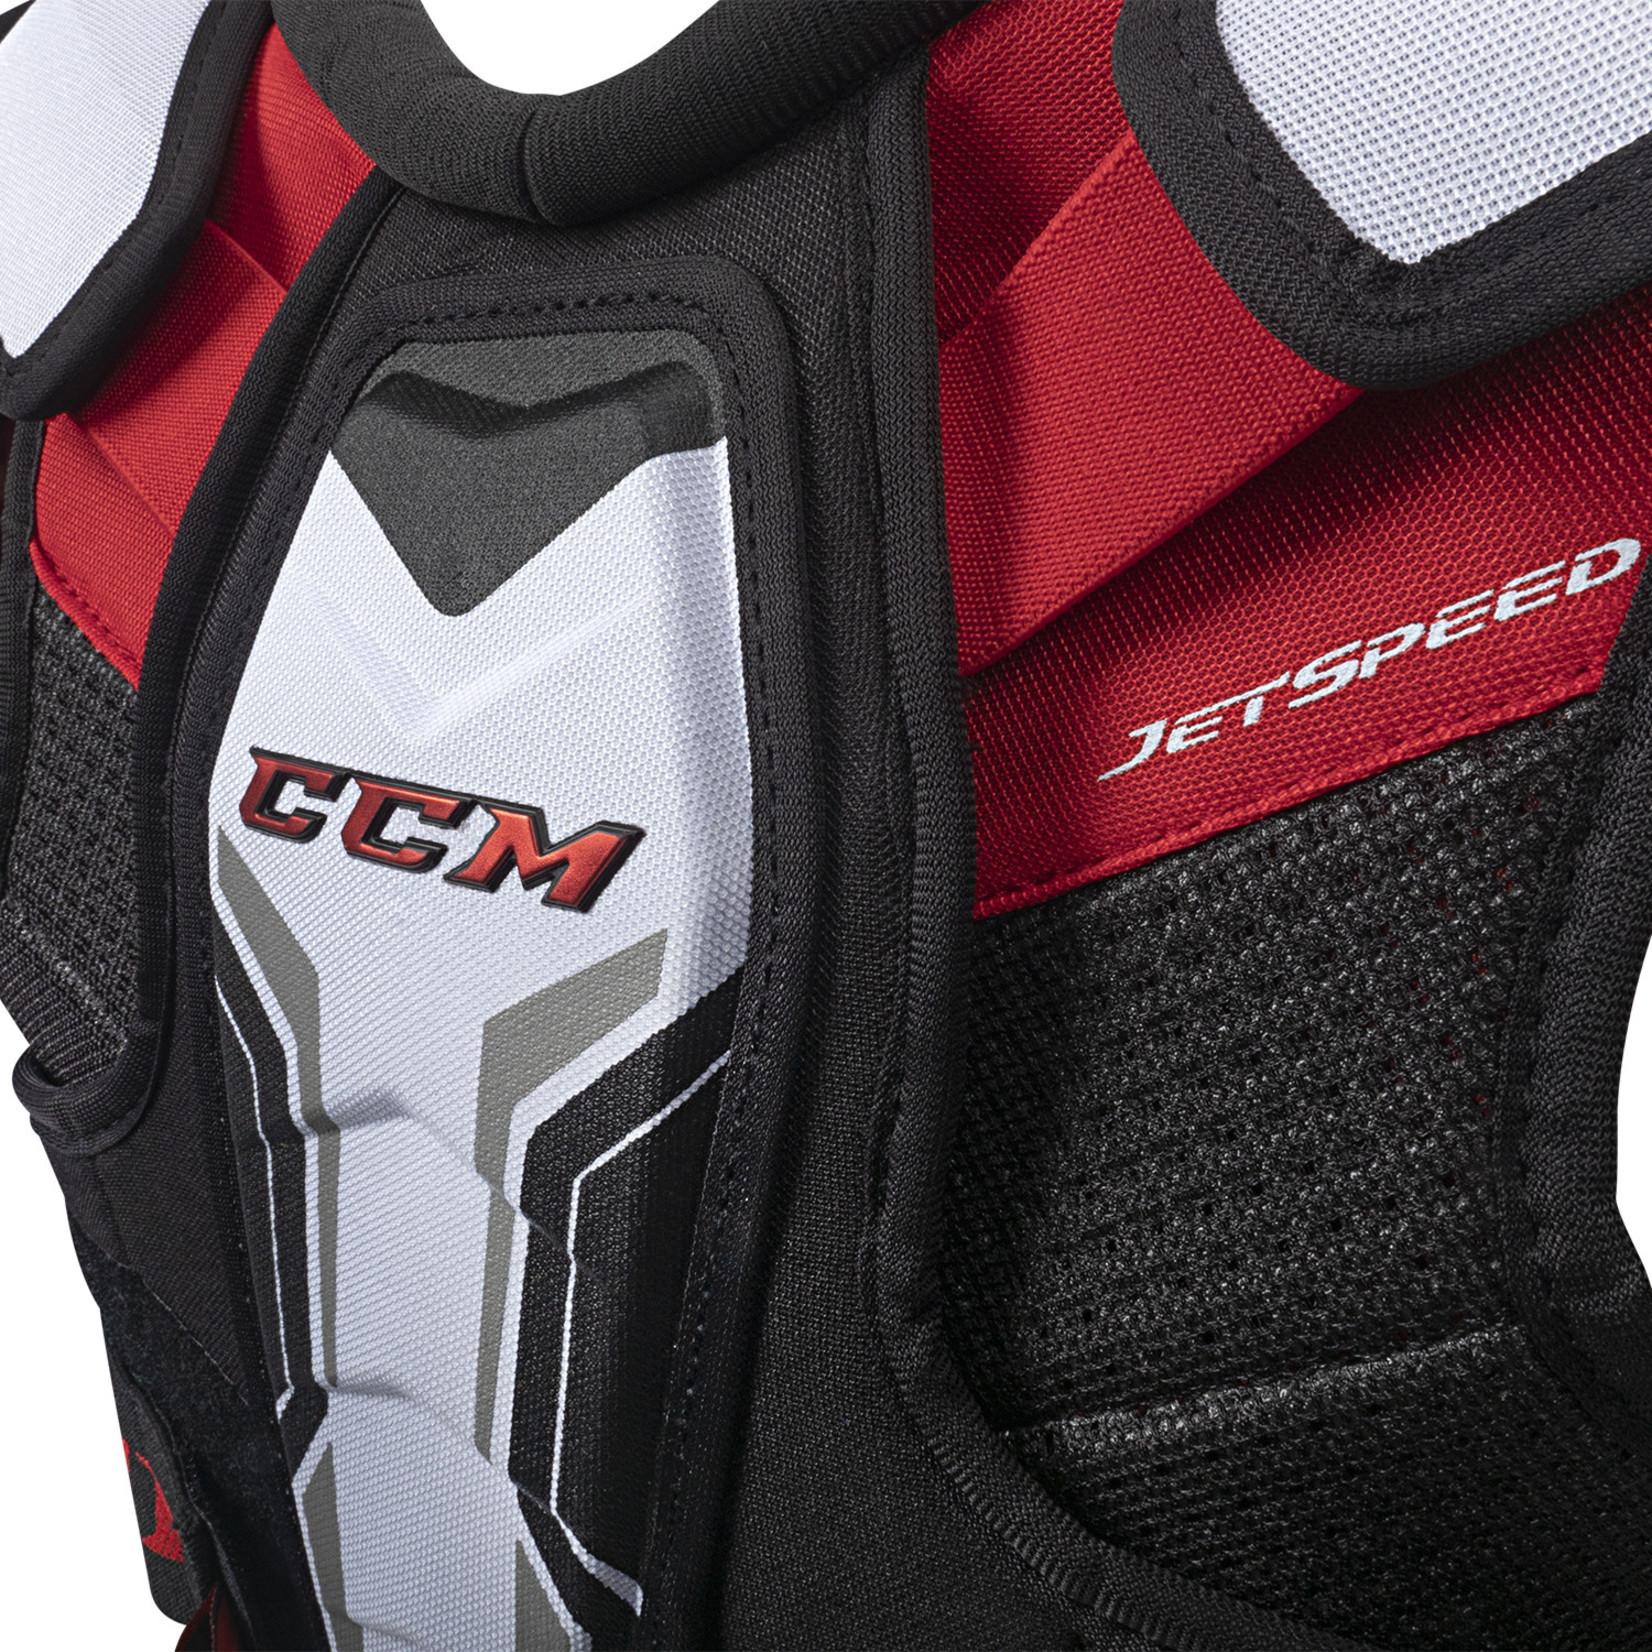 CCM CCM Hockey Shoulder Pads, Jetspeed Xtra Plus, Senior